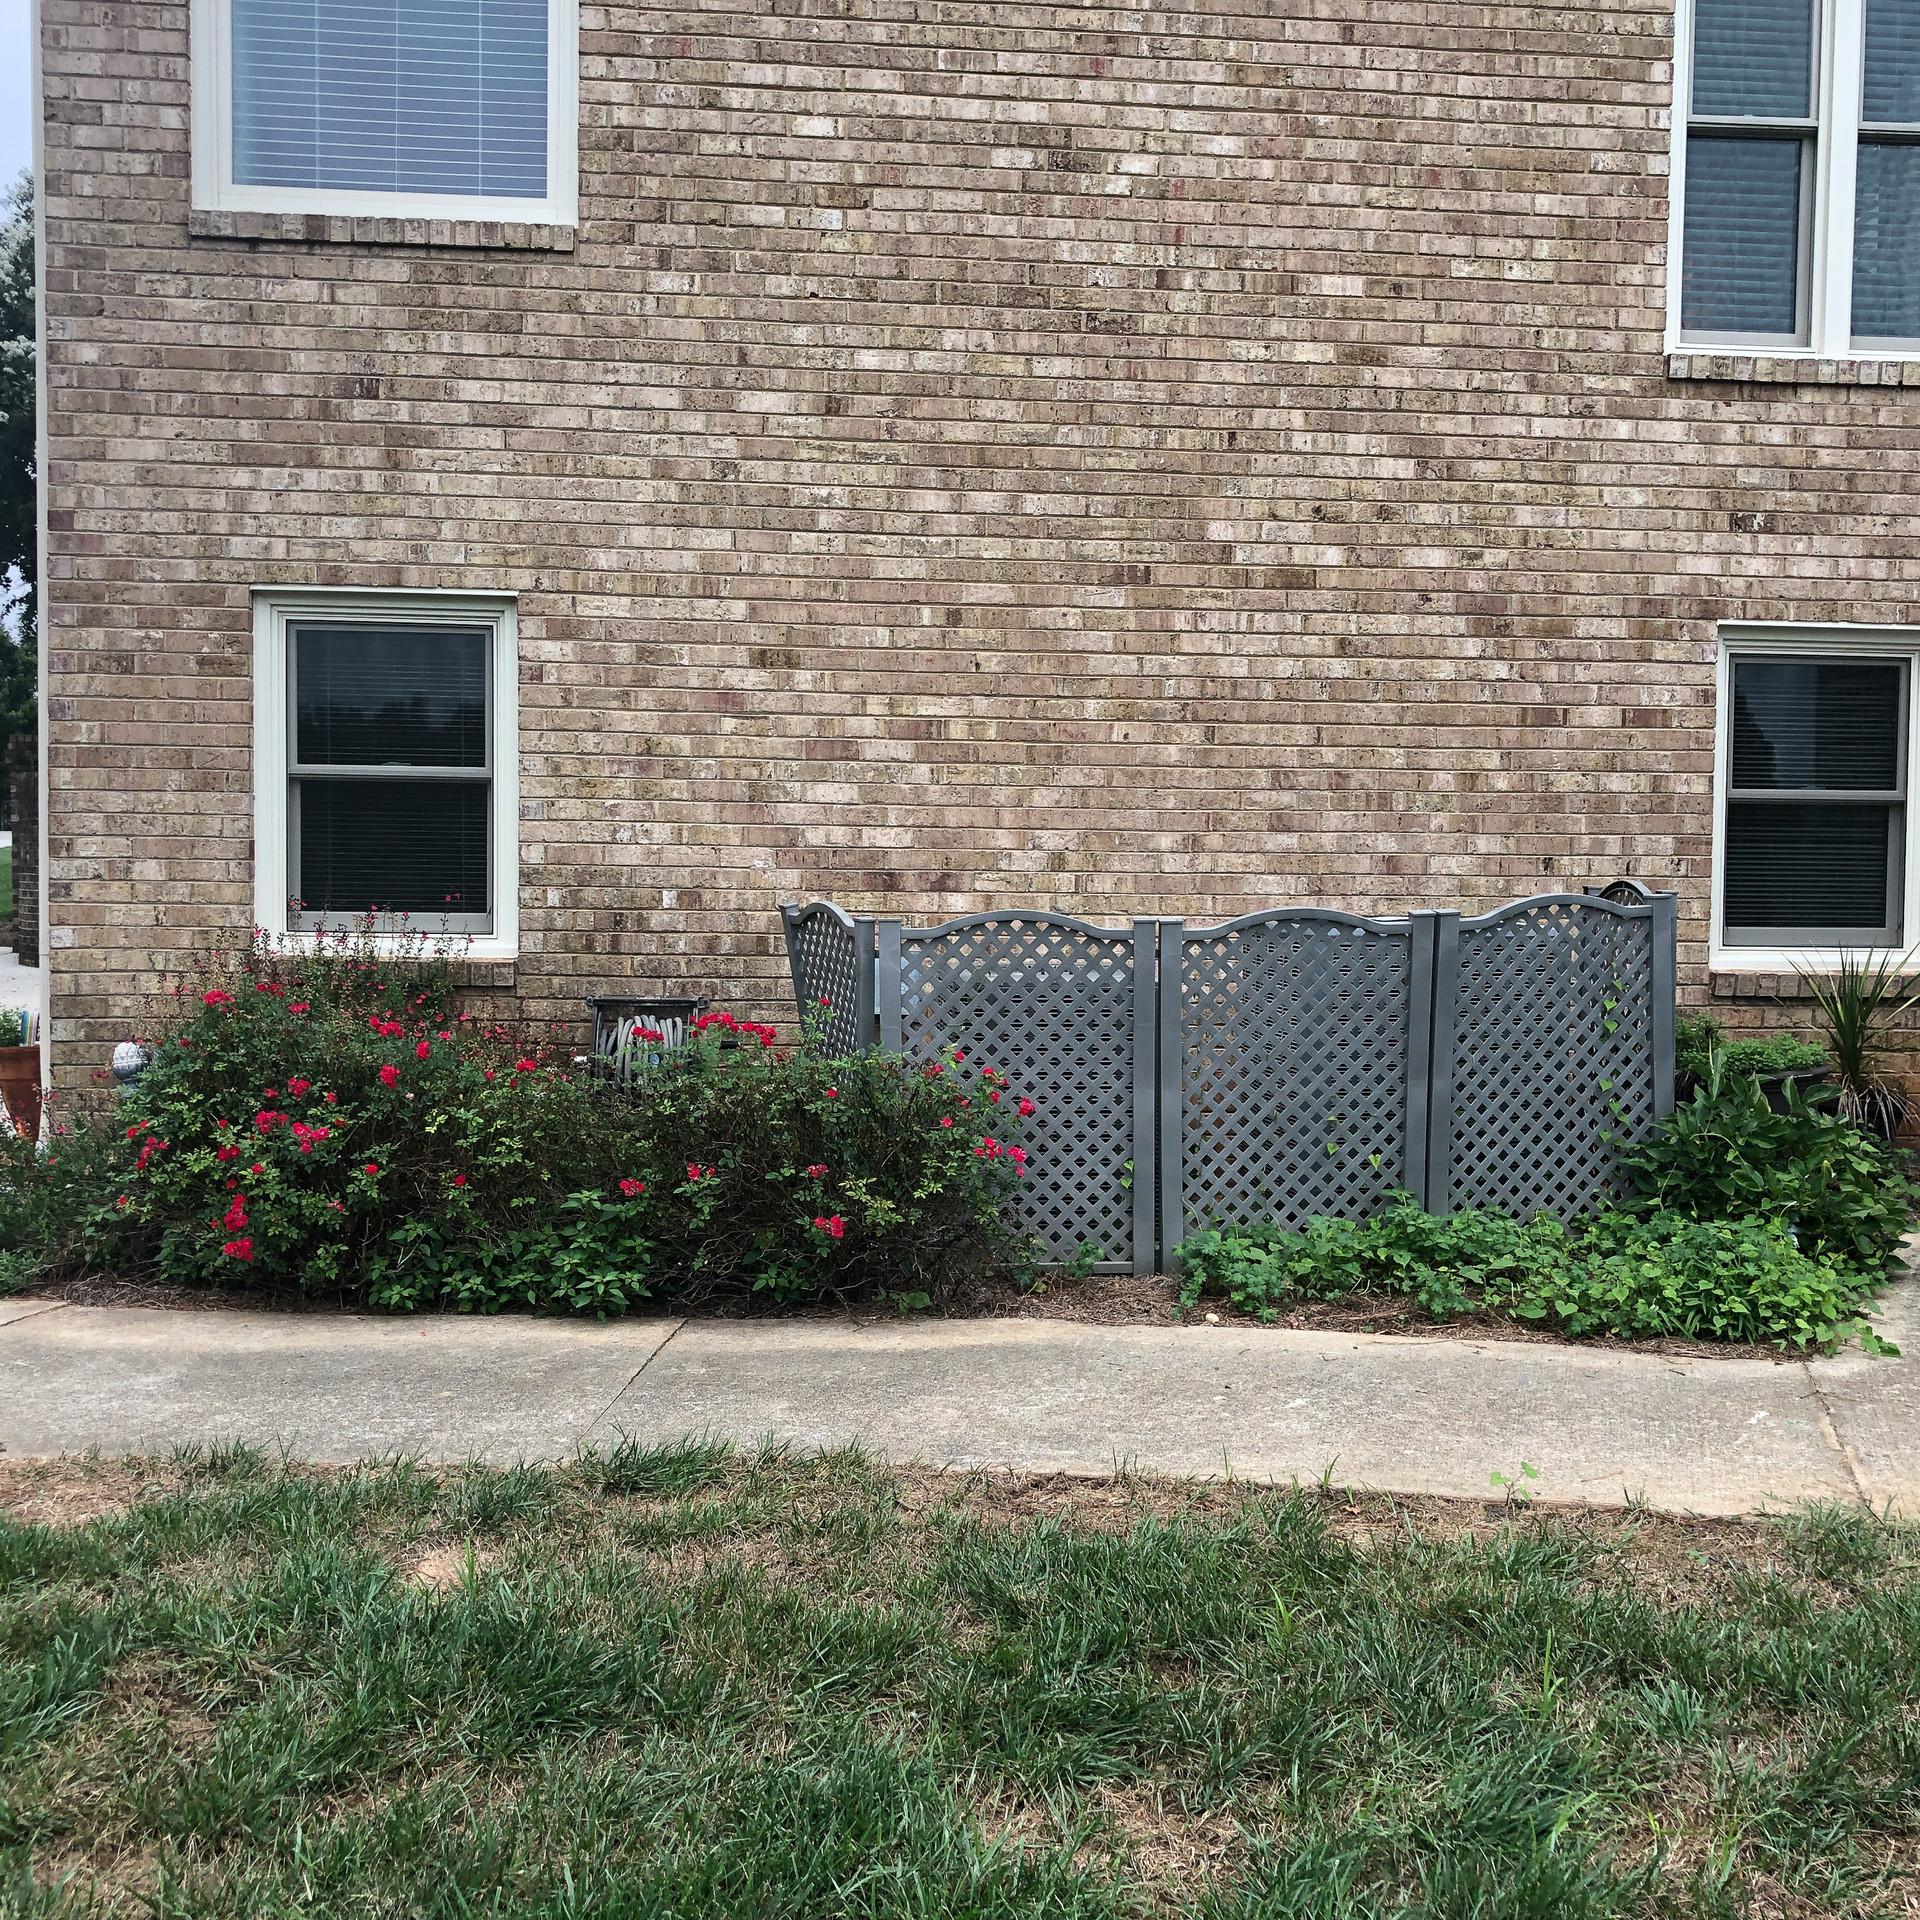 Backyard Landscaping - Before